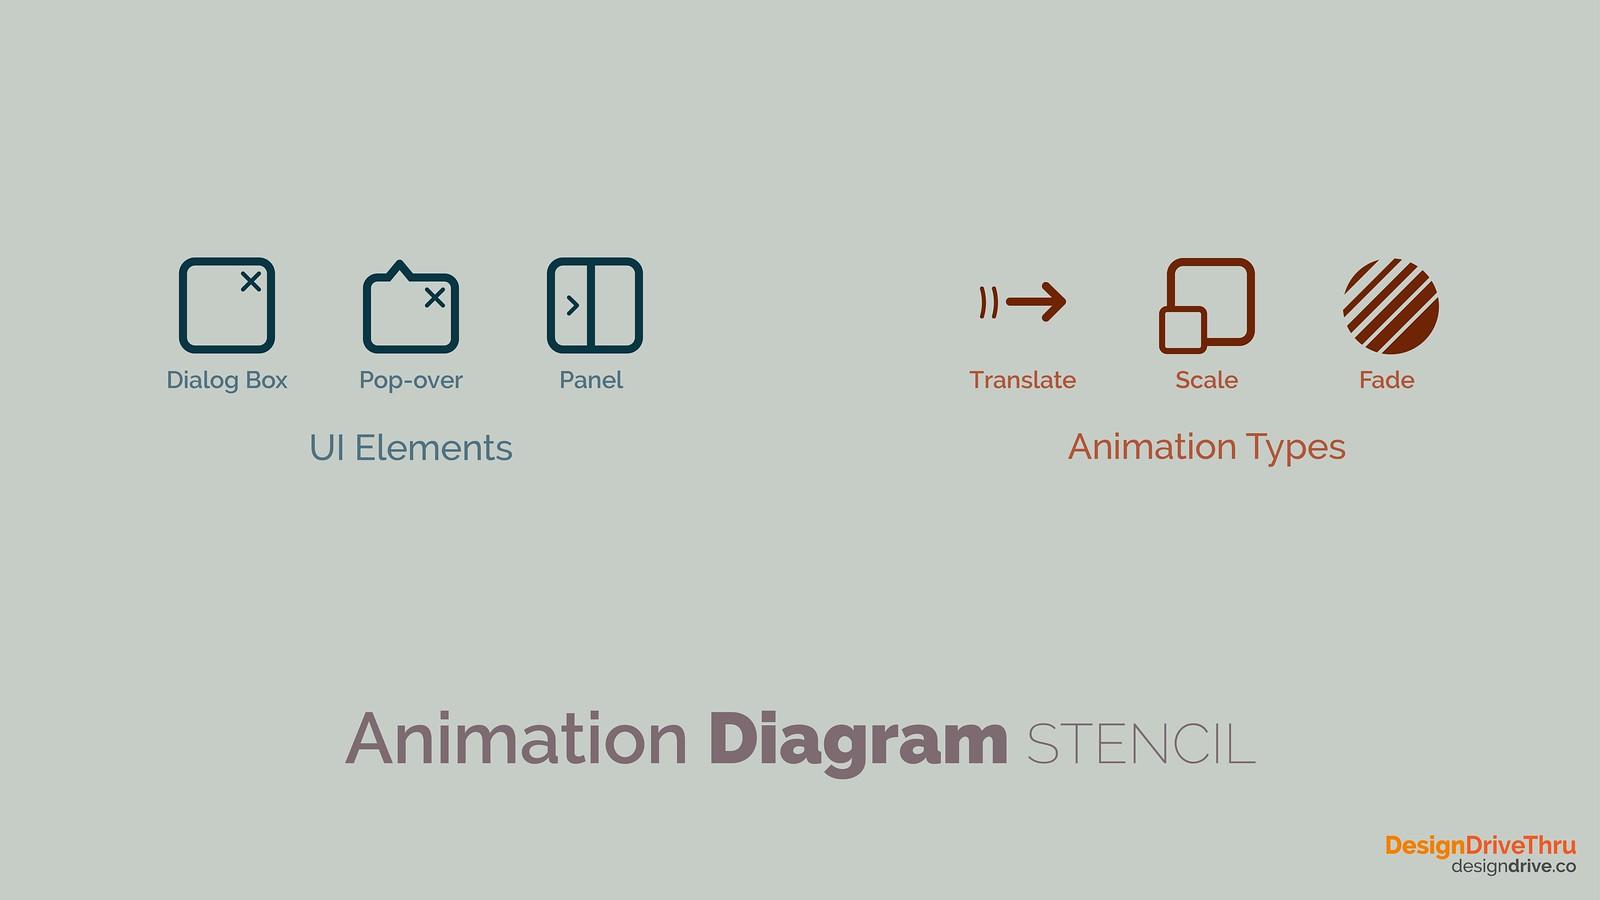 Animation Diagram Stencil